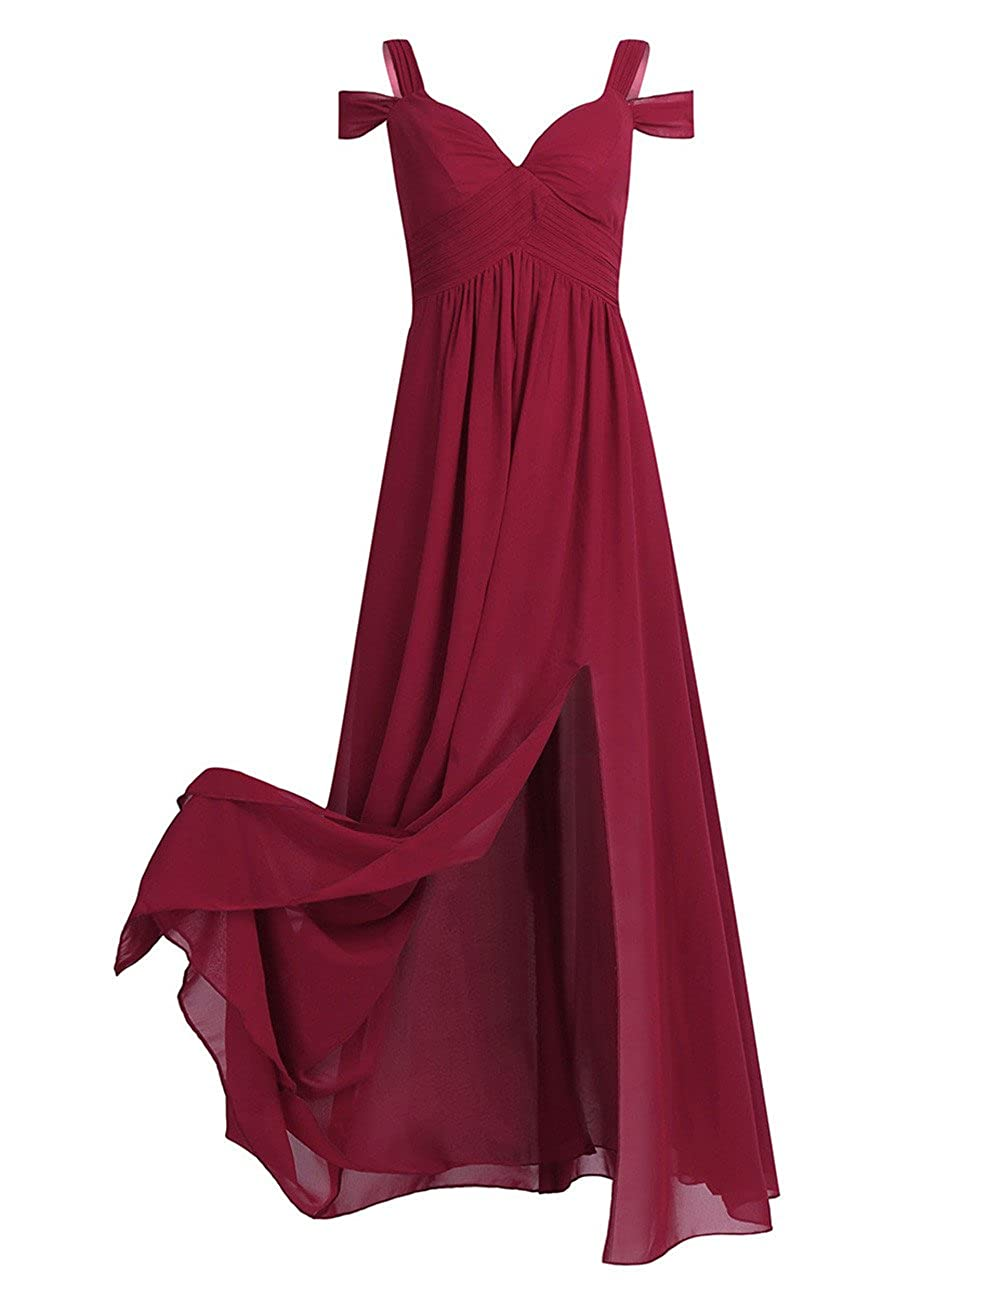 e7ba4952964f8 Sleeveless Floor Length Slim lace chiffon evening Formal dress.  One-the-shoulder and side split design, pleated padded top bodice, deep V -neckline